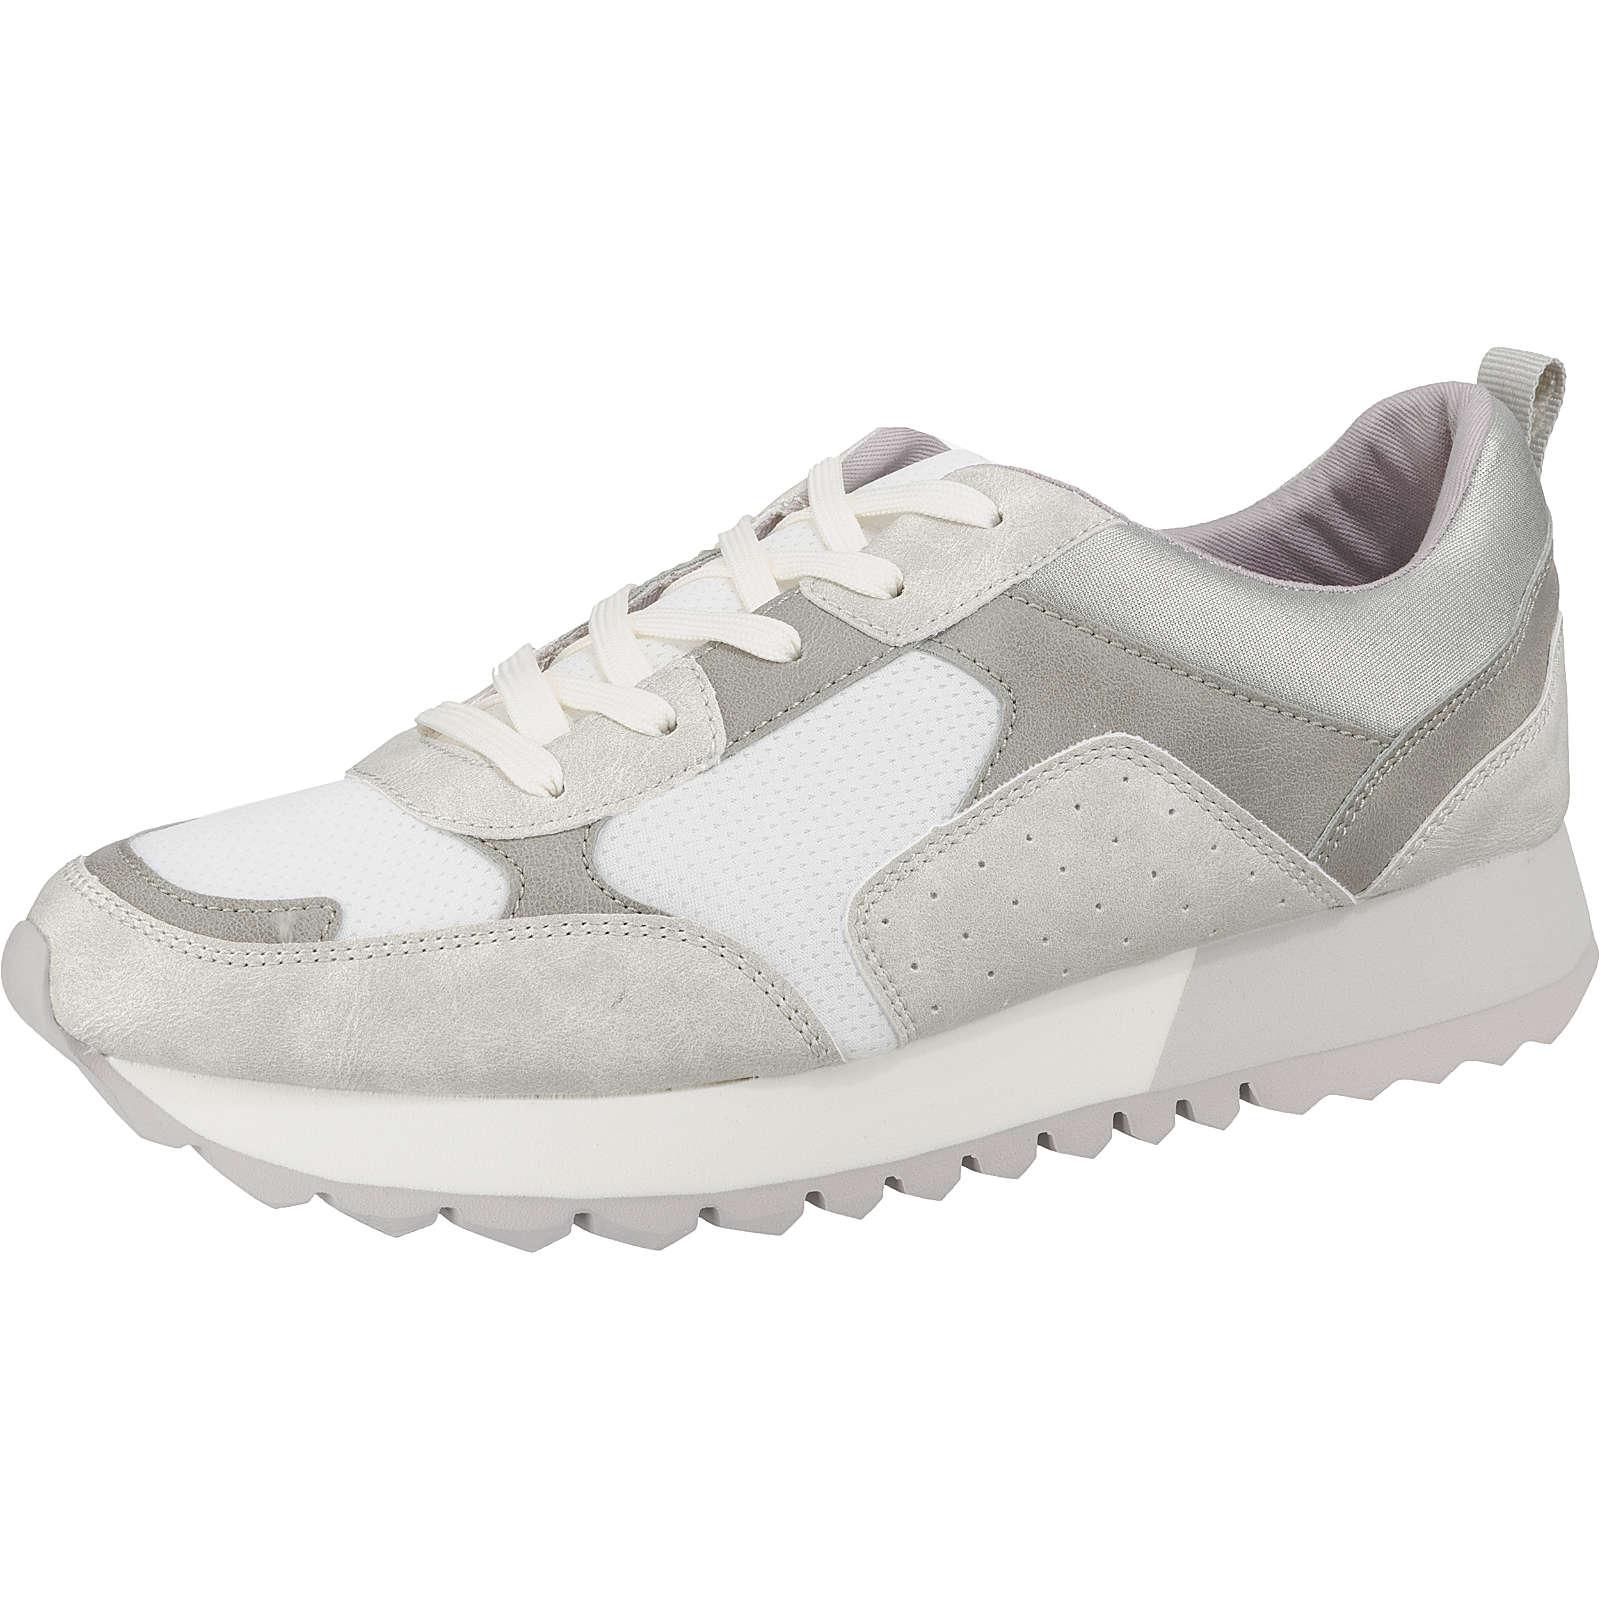 s.Oliver Sneakers Low grau-kombi Damen Gr. 40